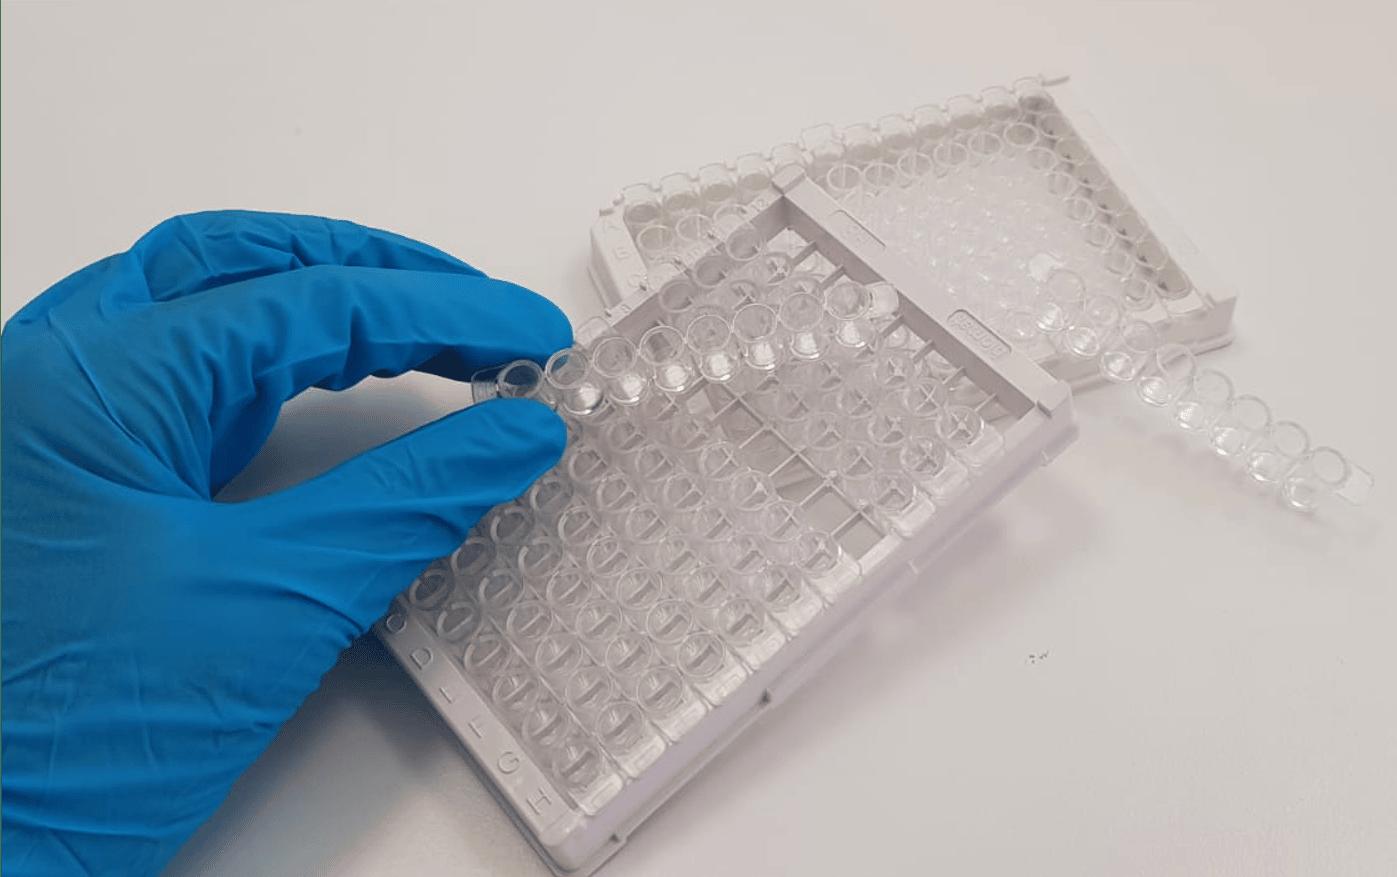 Biomat Immunotoxicity Plates for ELISA test